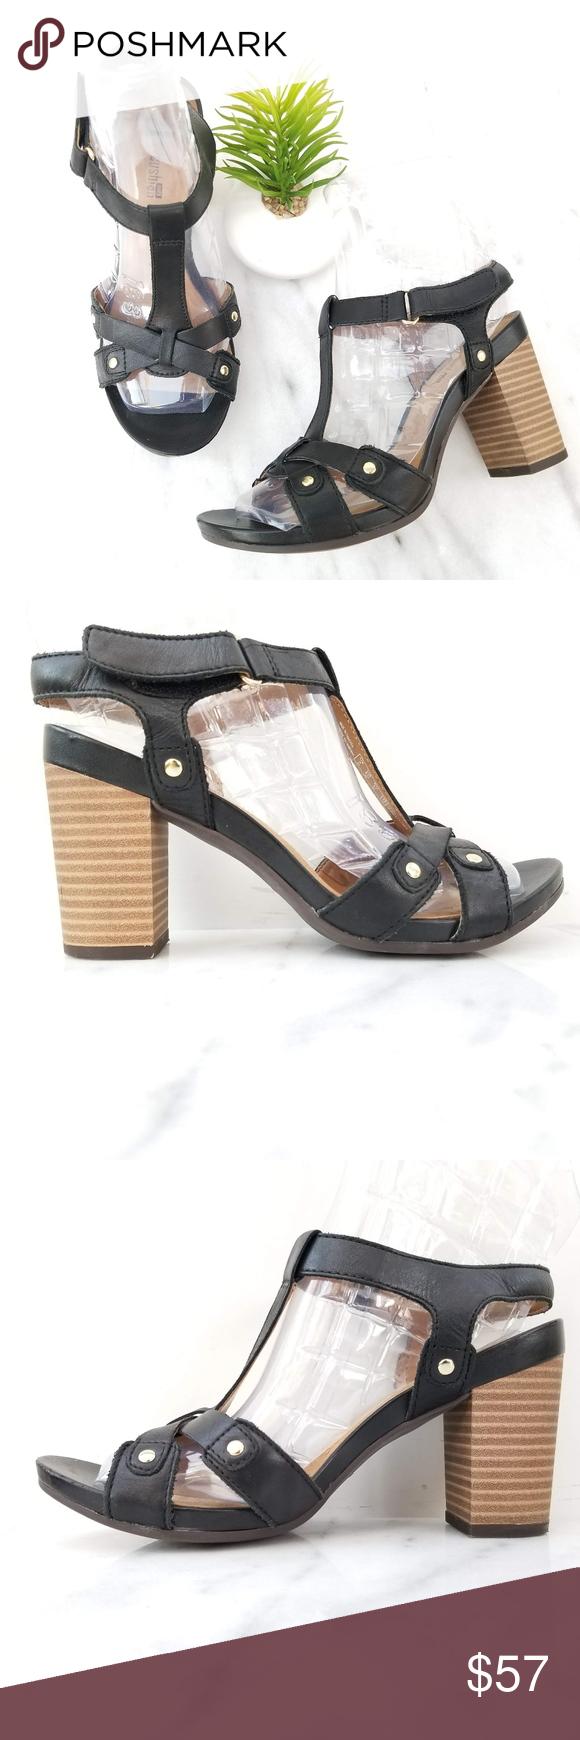 645ff0386071 CLARKS Banoy Valtina Open Toe Sandal T-Strap Black CLARKS Banoy Valtina  T-Strap